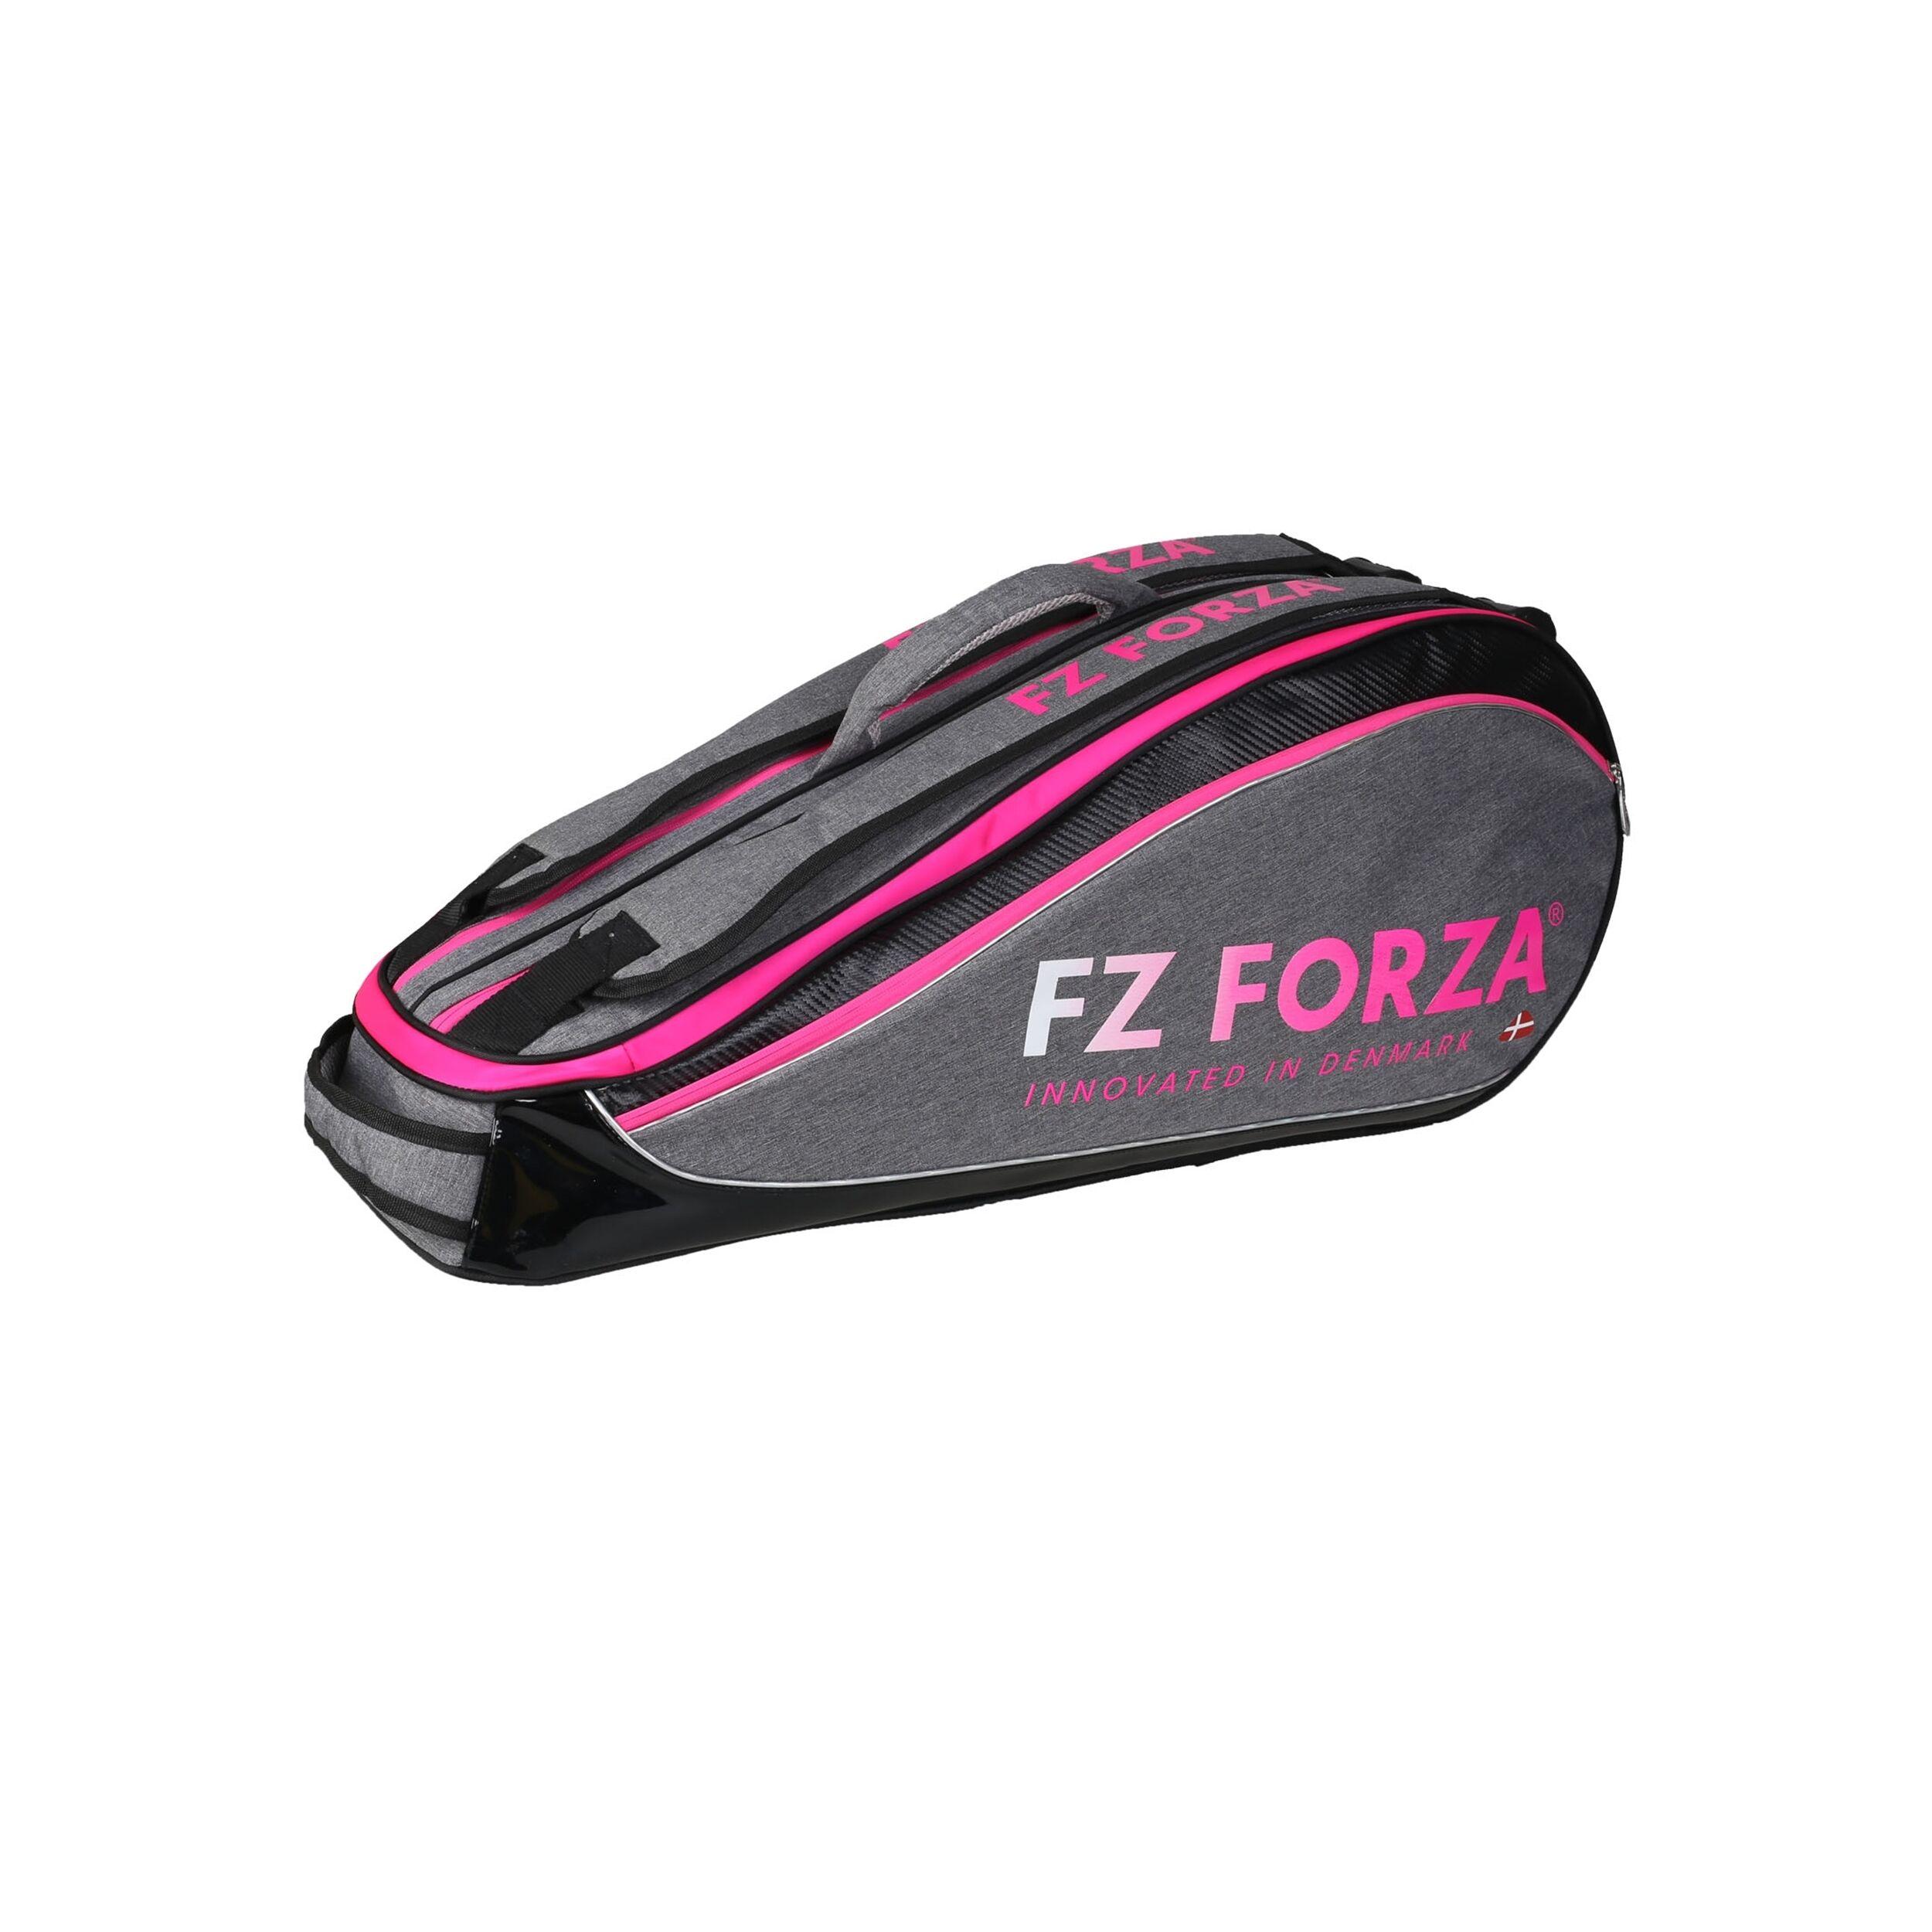 FZ Forza Harrison Bag x6 Sparkling Cosmo